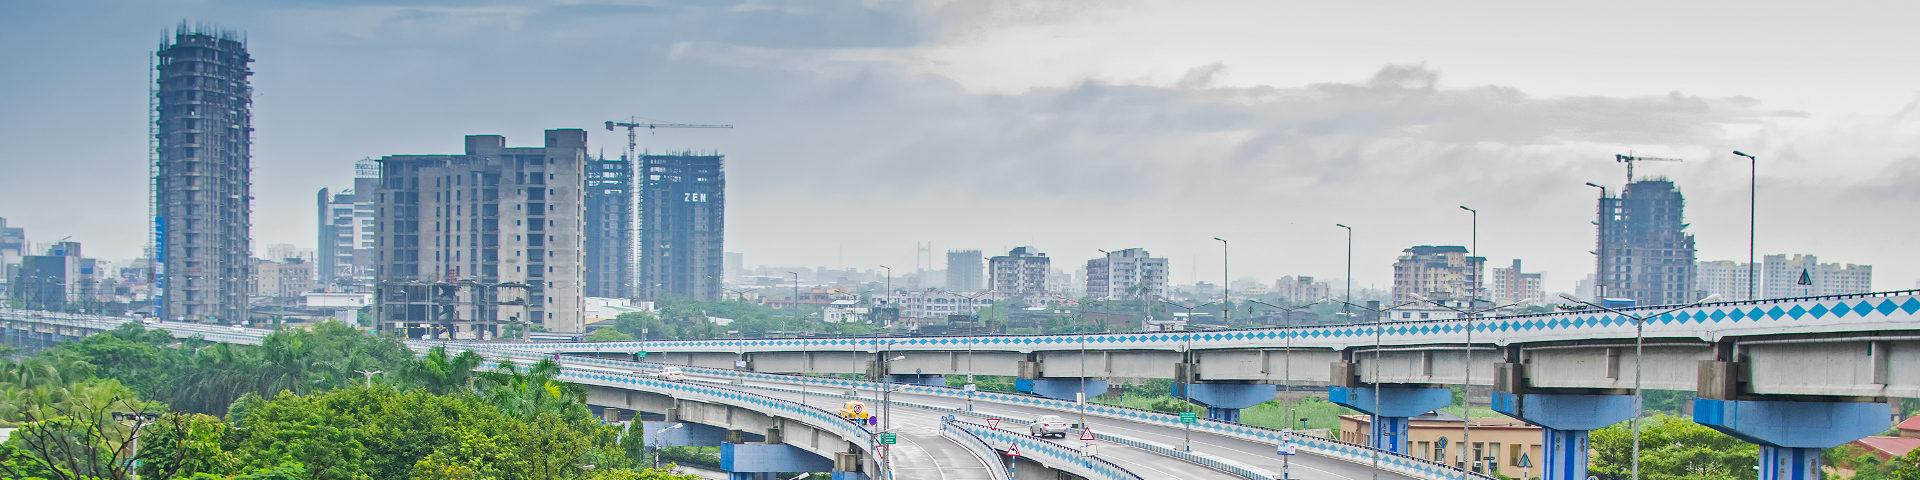 Kolkata hero banner